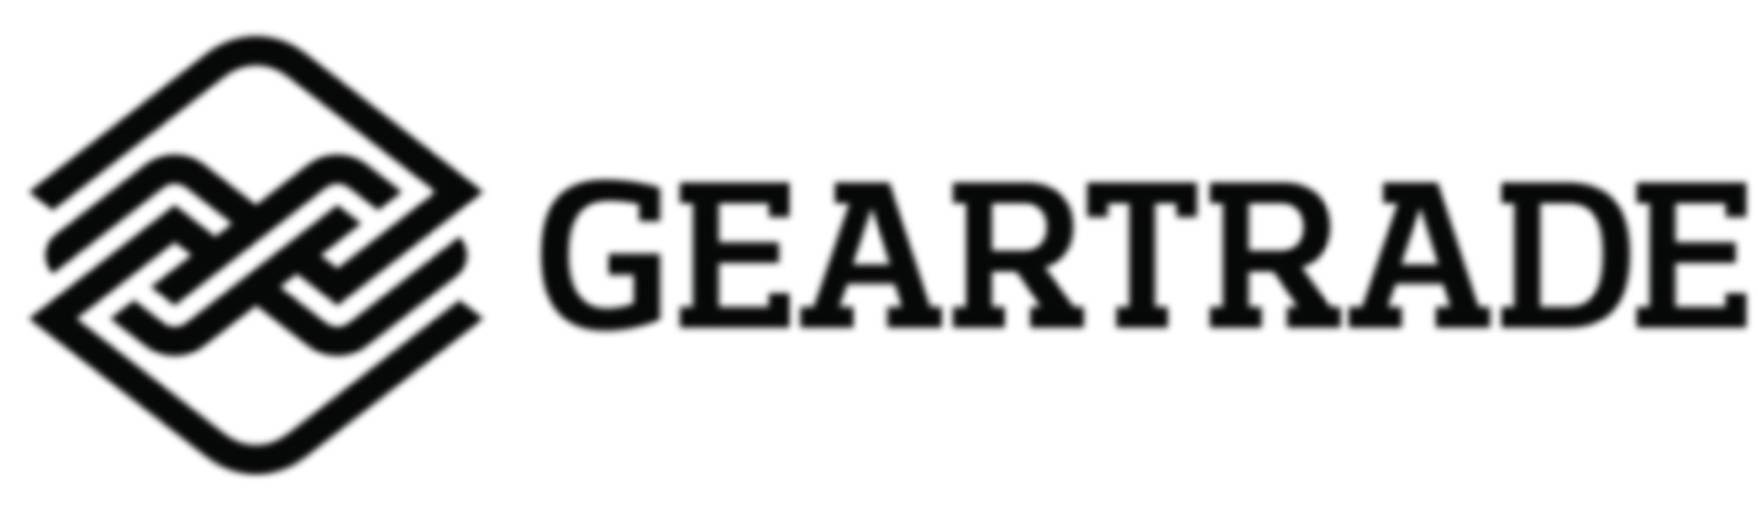 geartrade logo